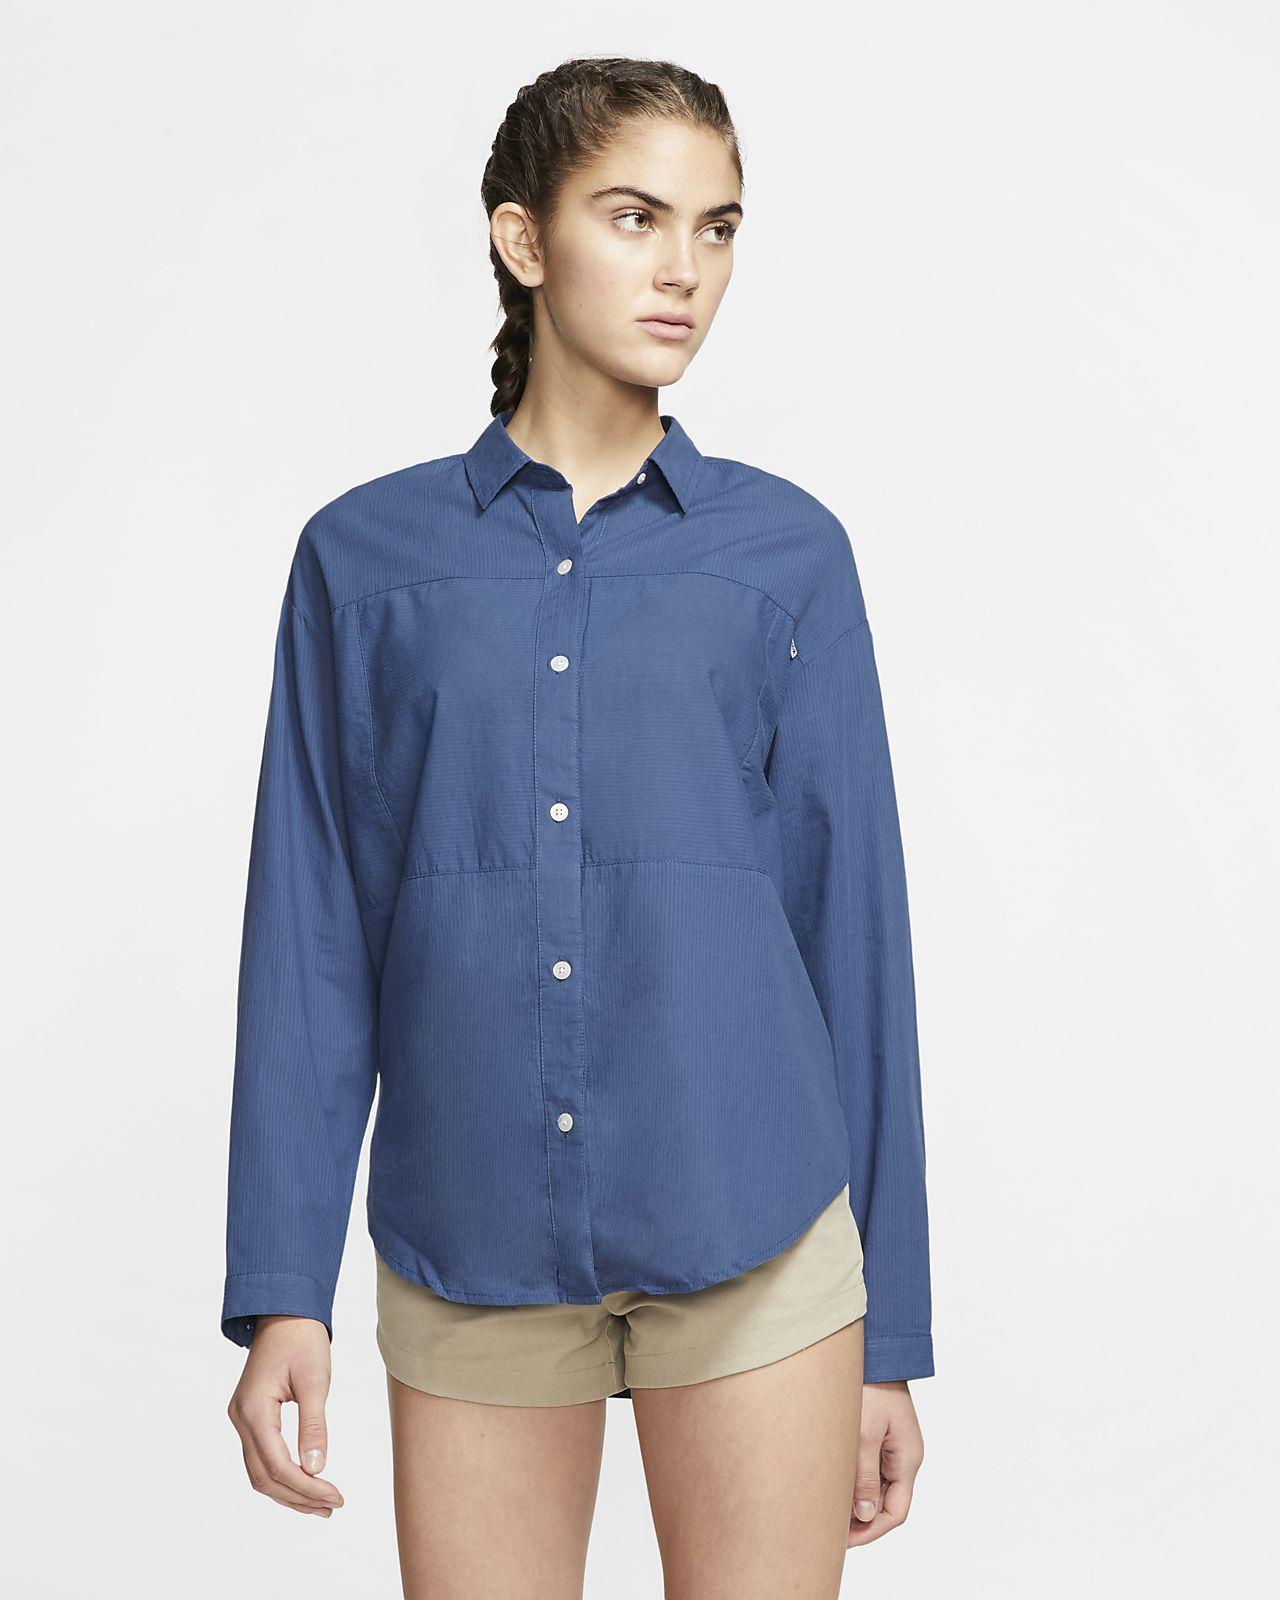 Hurley Wilson Shadow Dolman Women's Shirt